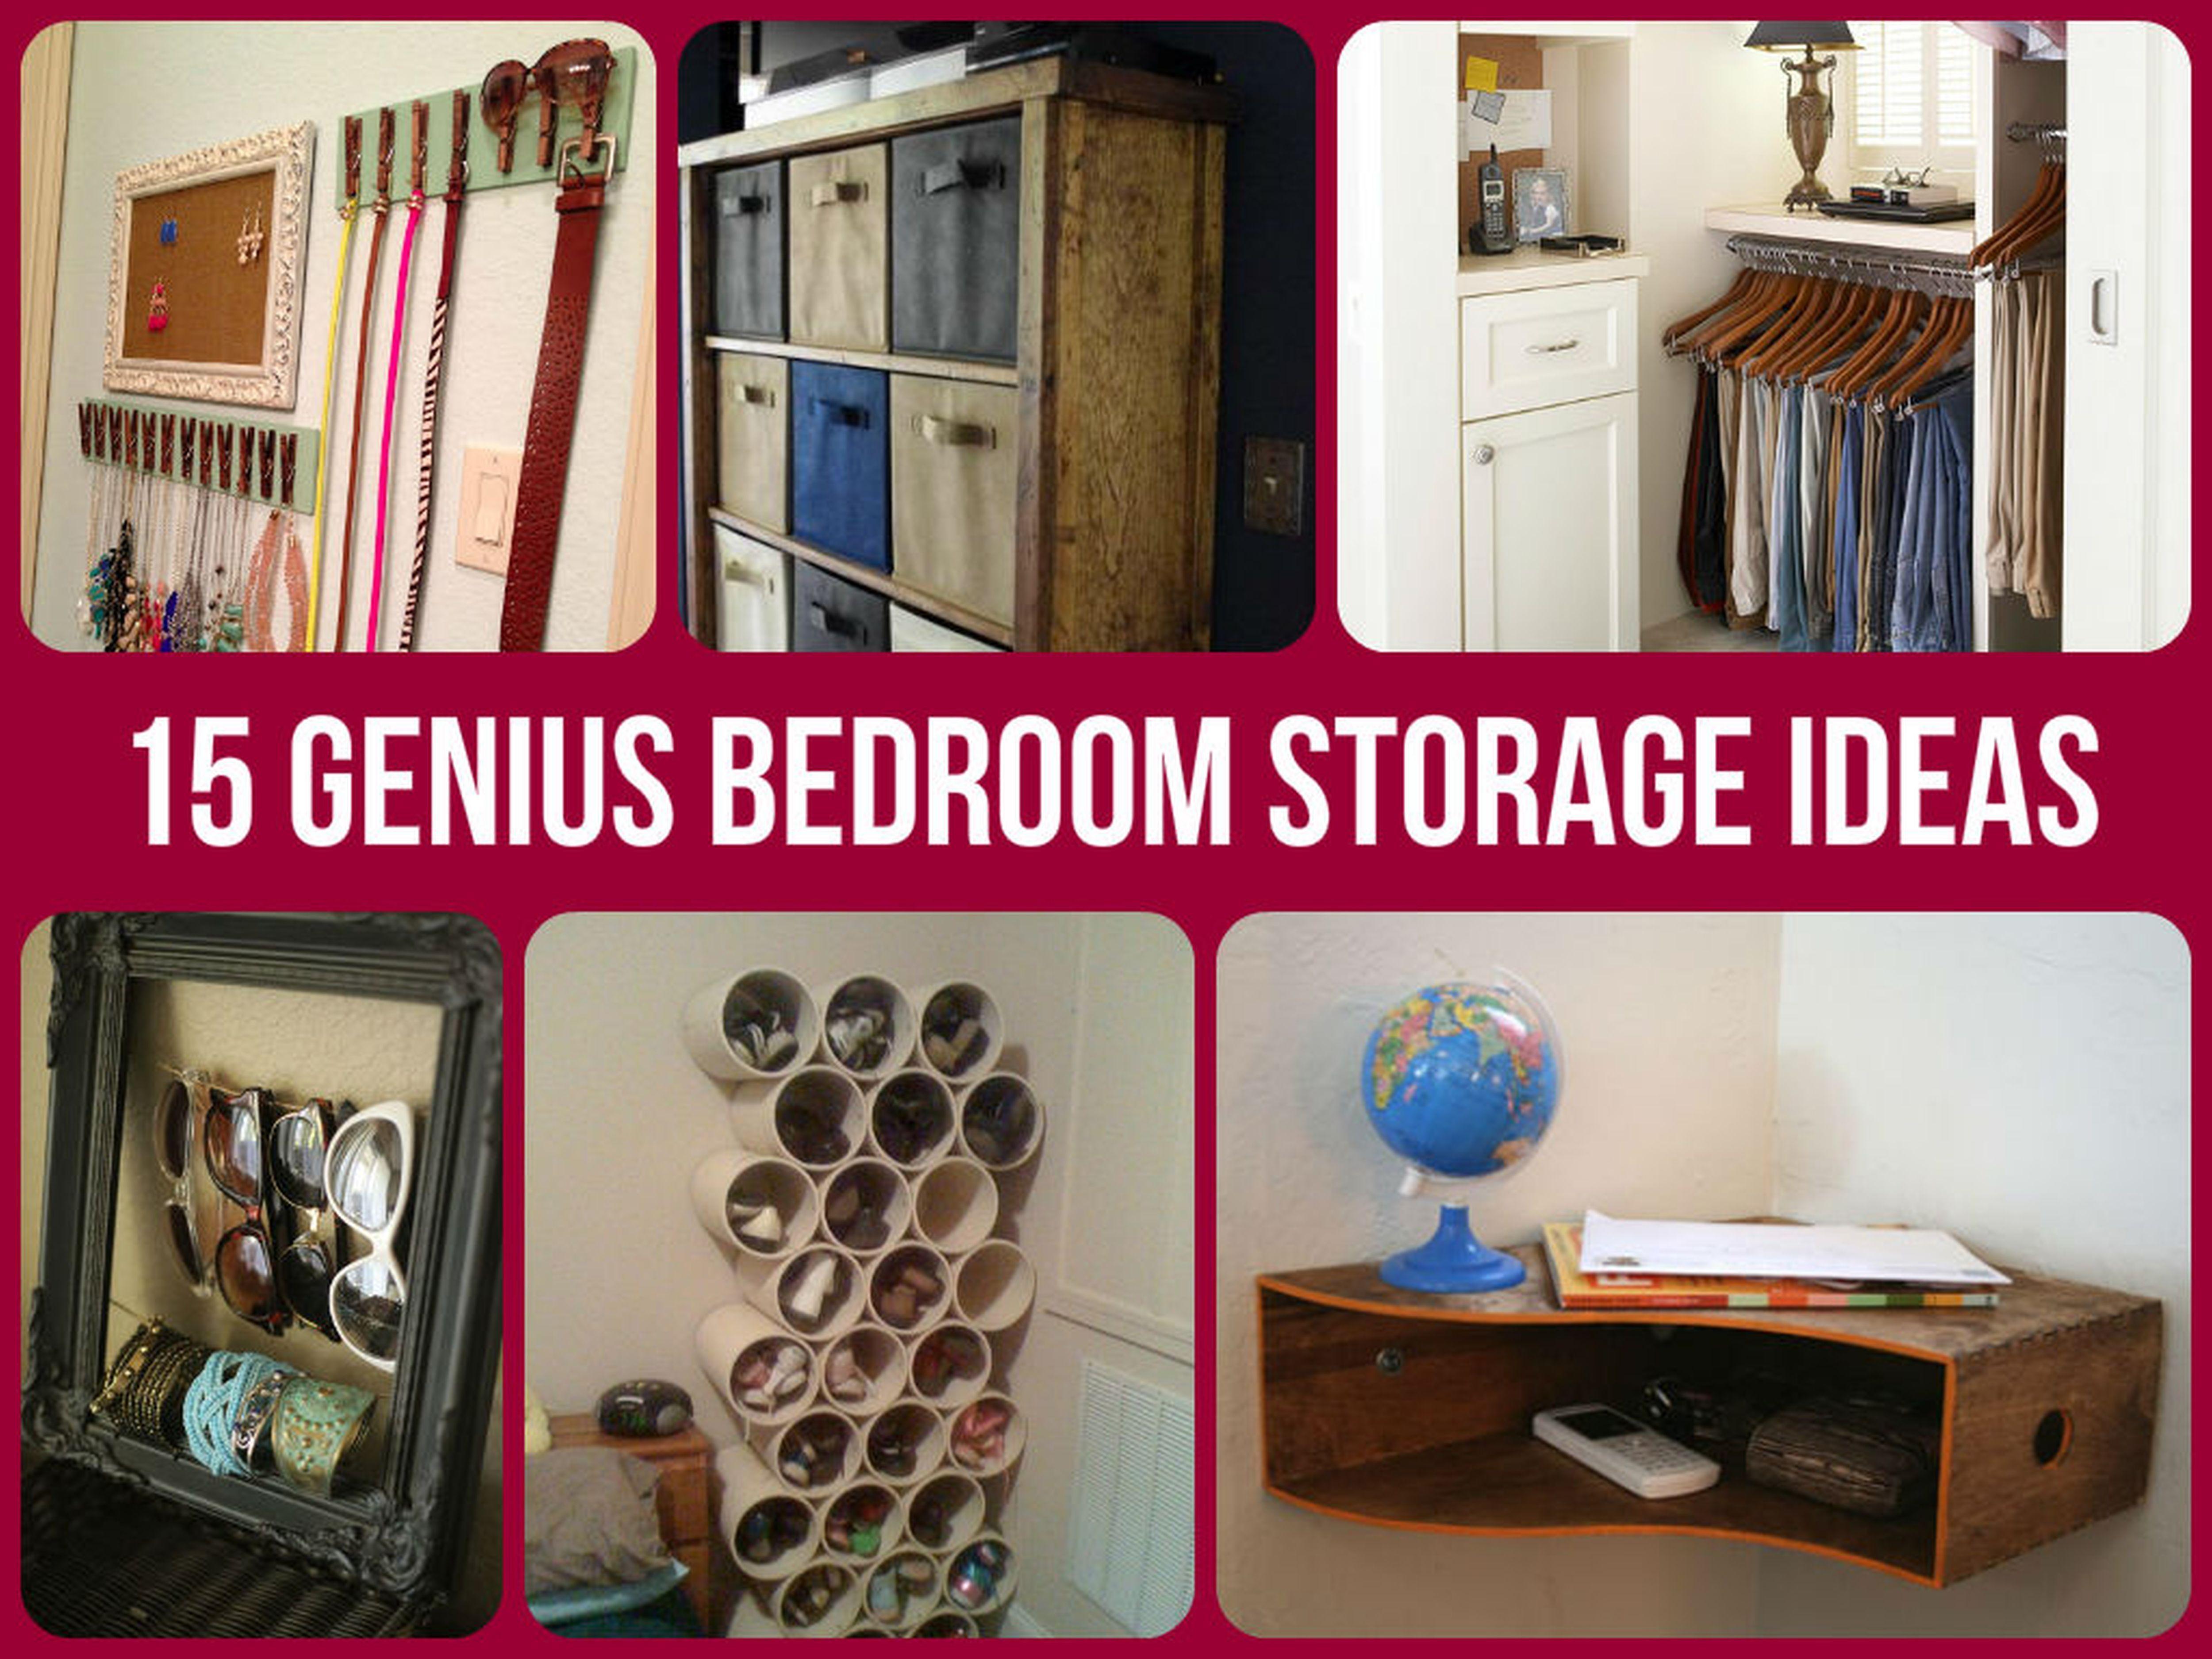 Diy Bedroom Clothing Storage Ideas Https Www Otoseriilan Com